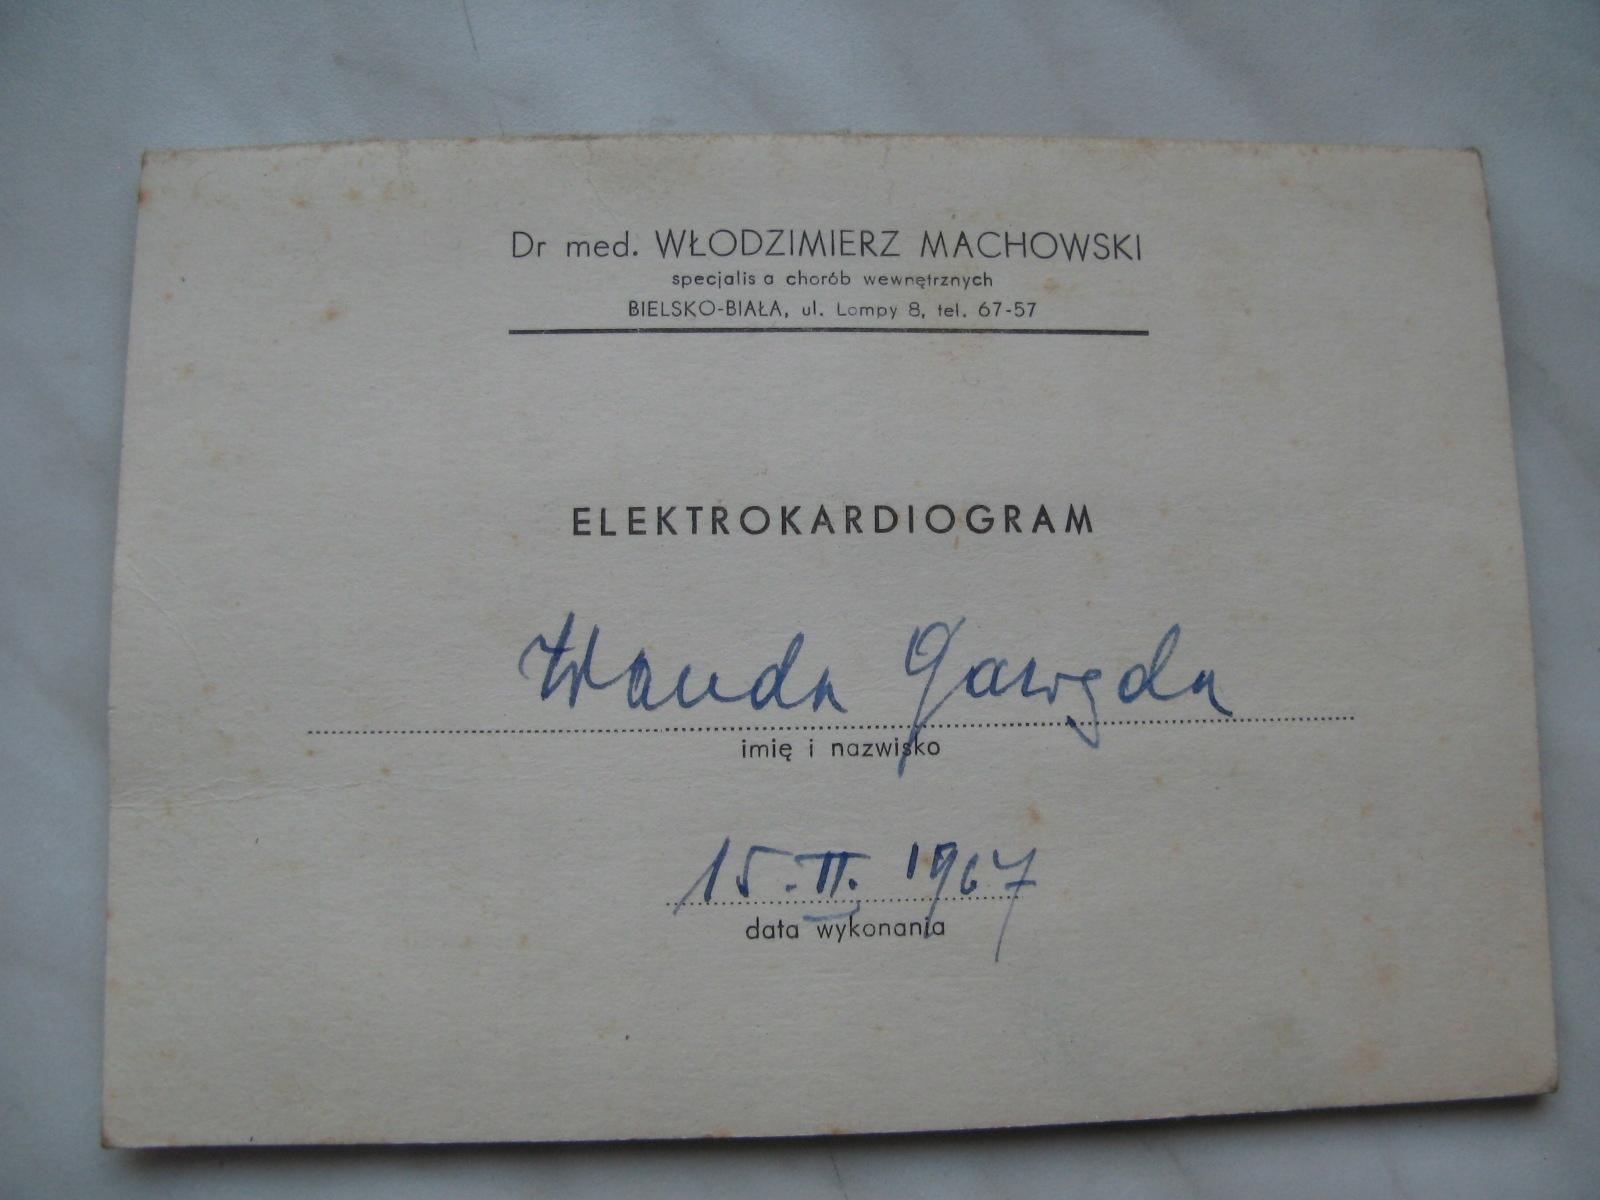 ЭЛЕКТРОКАРДИОГРАММА ПРЛ 1967 г.